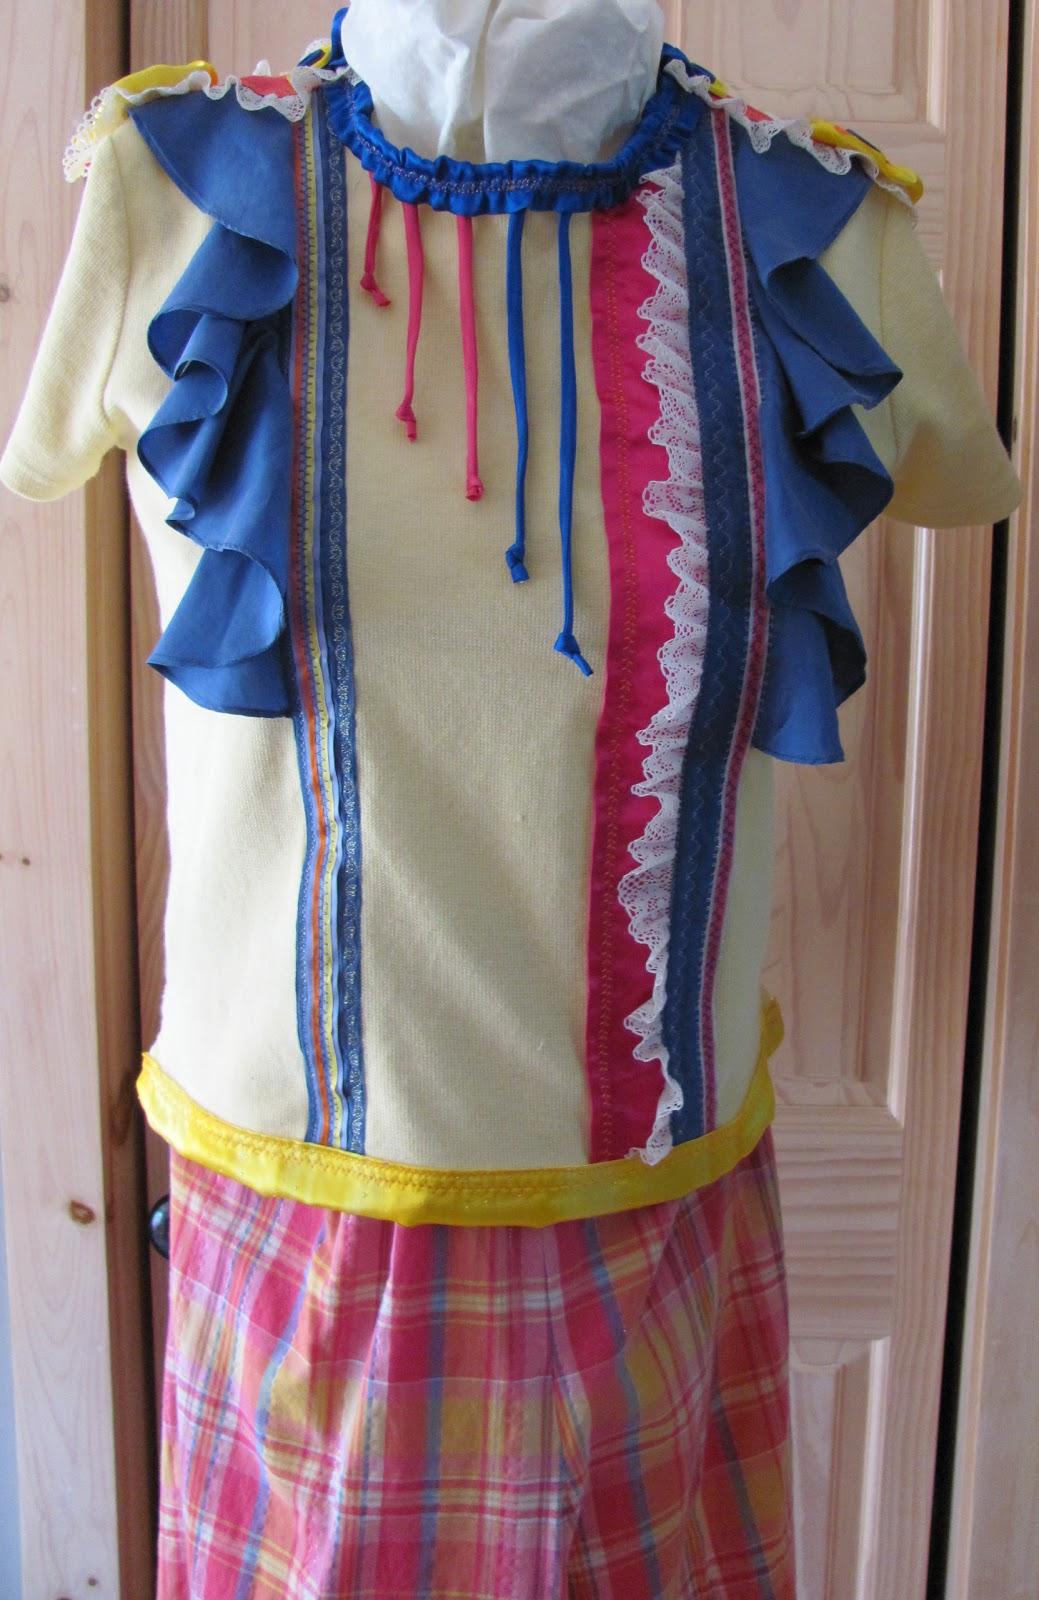 http://2.bp.blogspot.com/-fmwEzKTpnYw/ToDR08pbAPI/AAAAAAAACdE/ozZJyj_NR-w/s1600/pj+top+on+dress+form.jpg